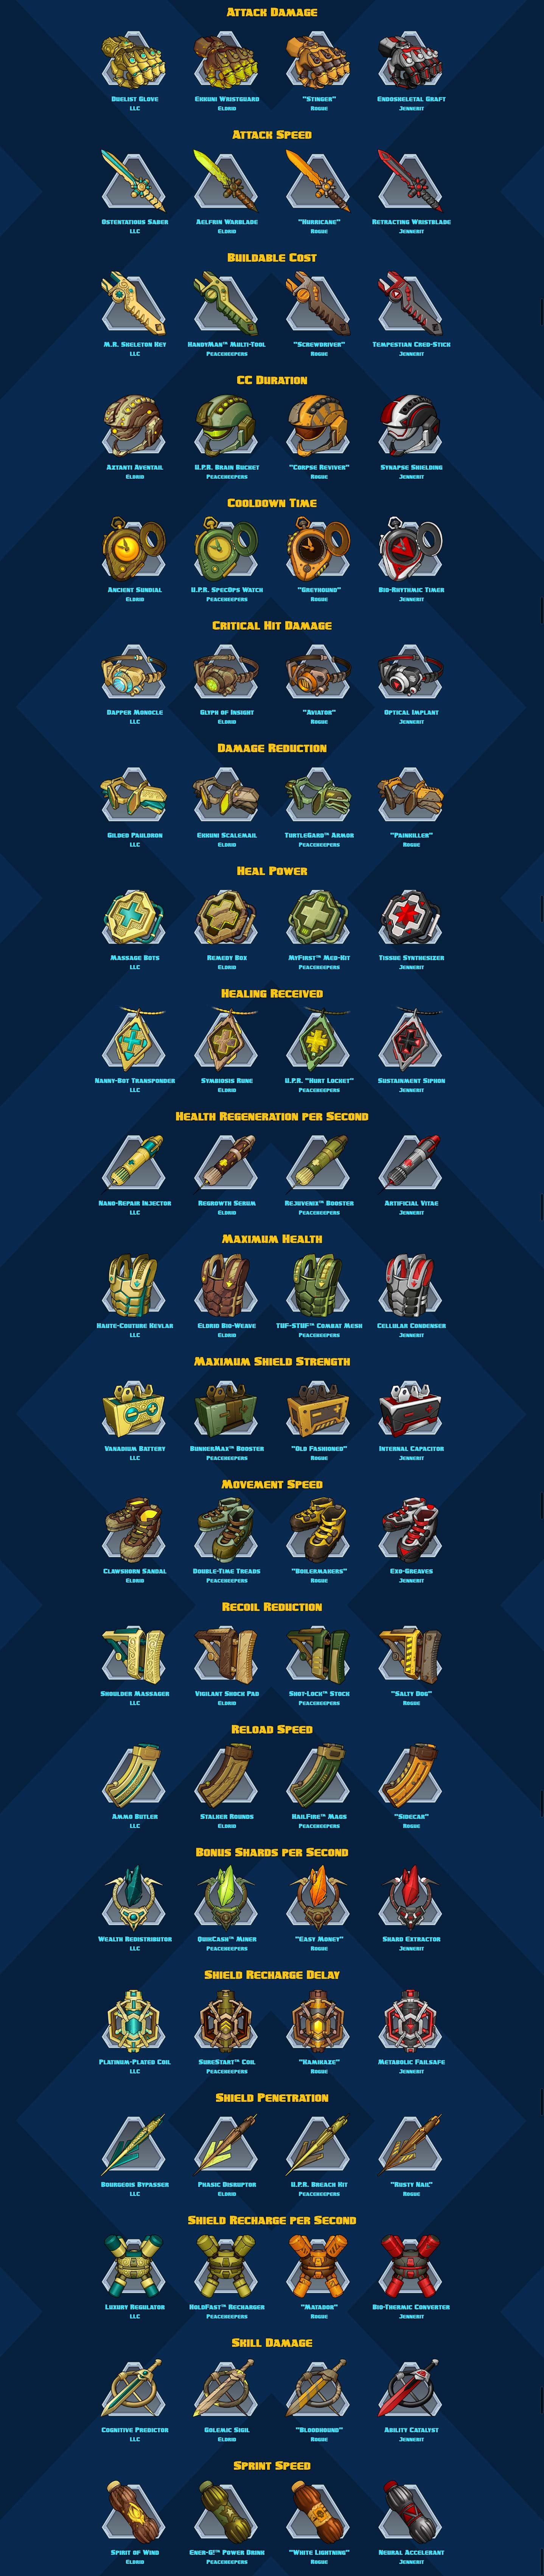 battleborn gear types infographic